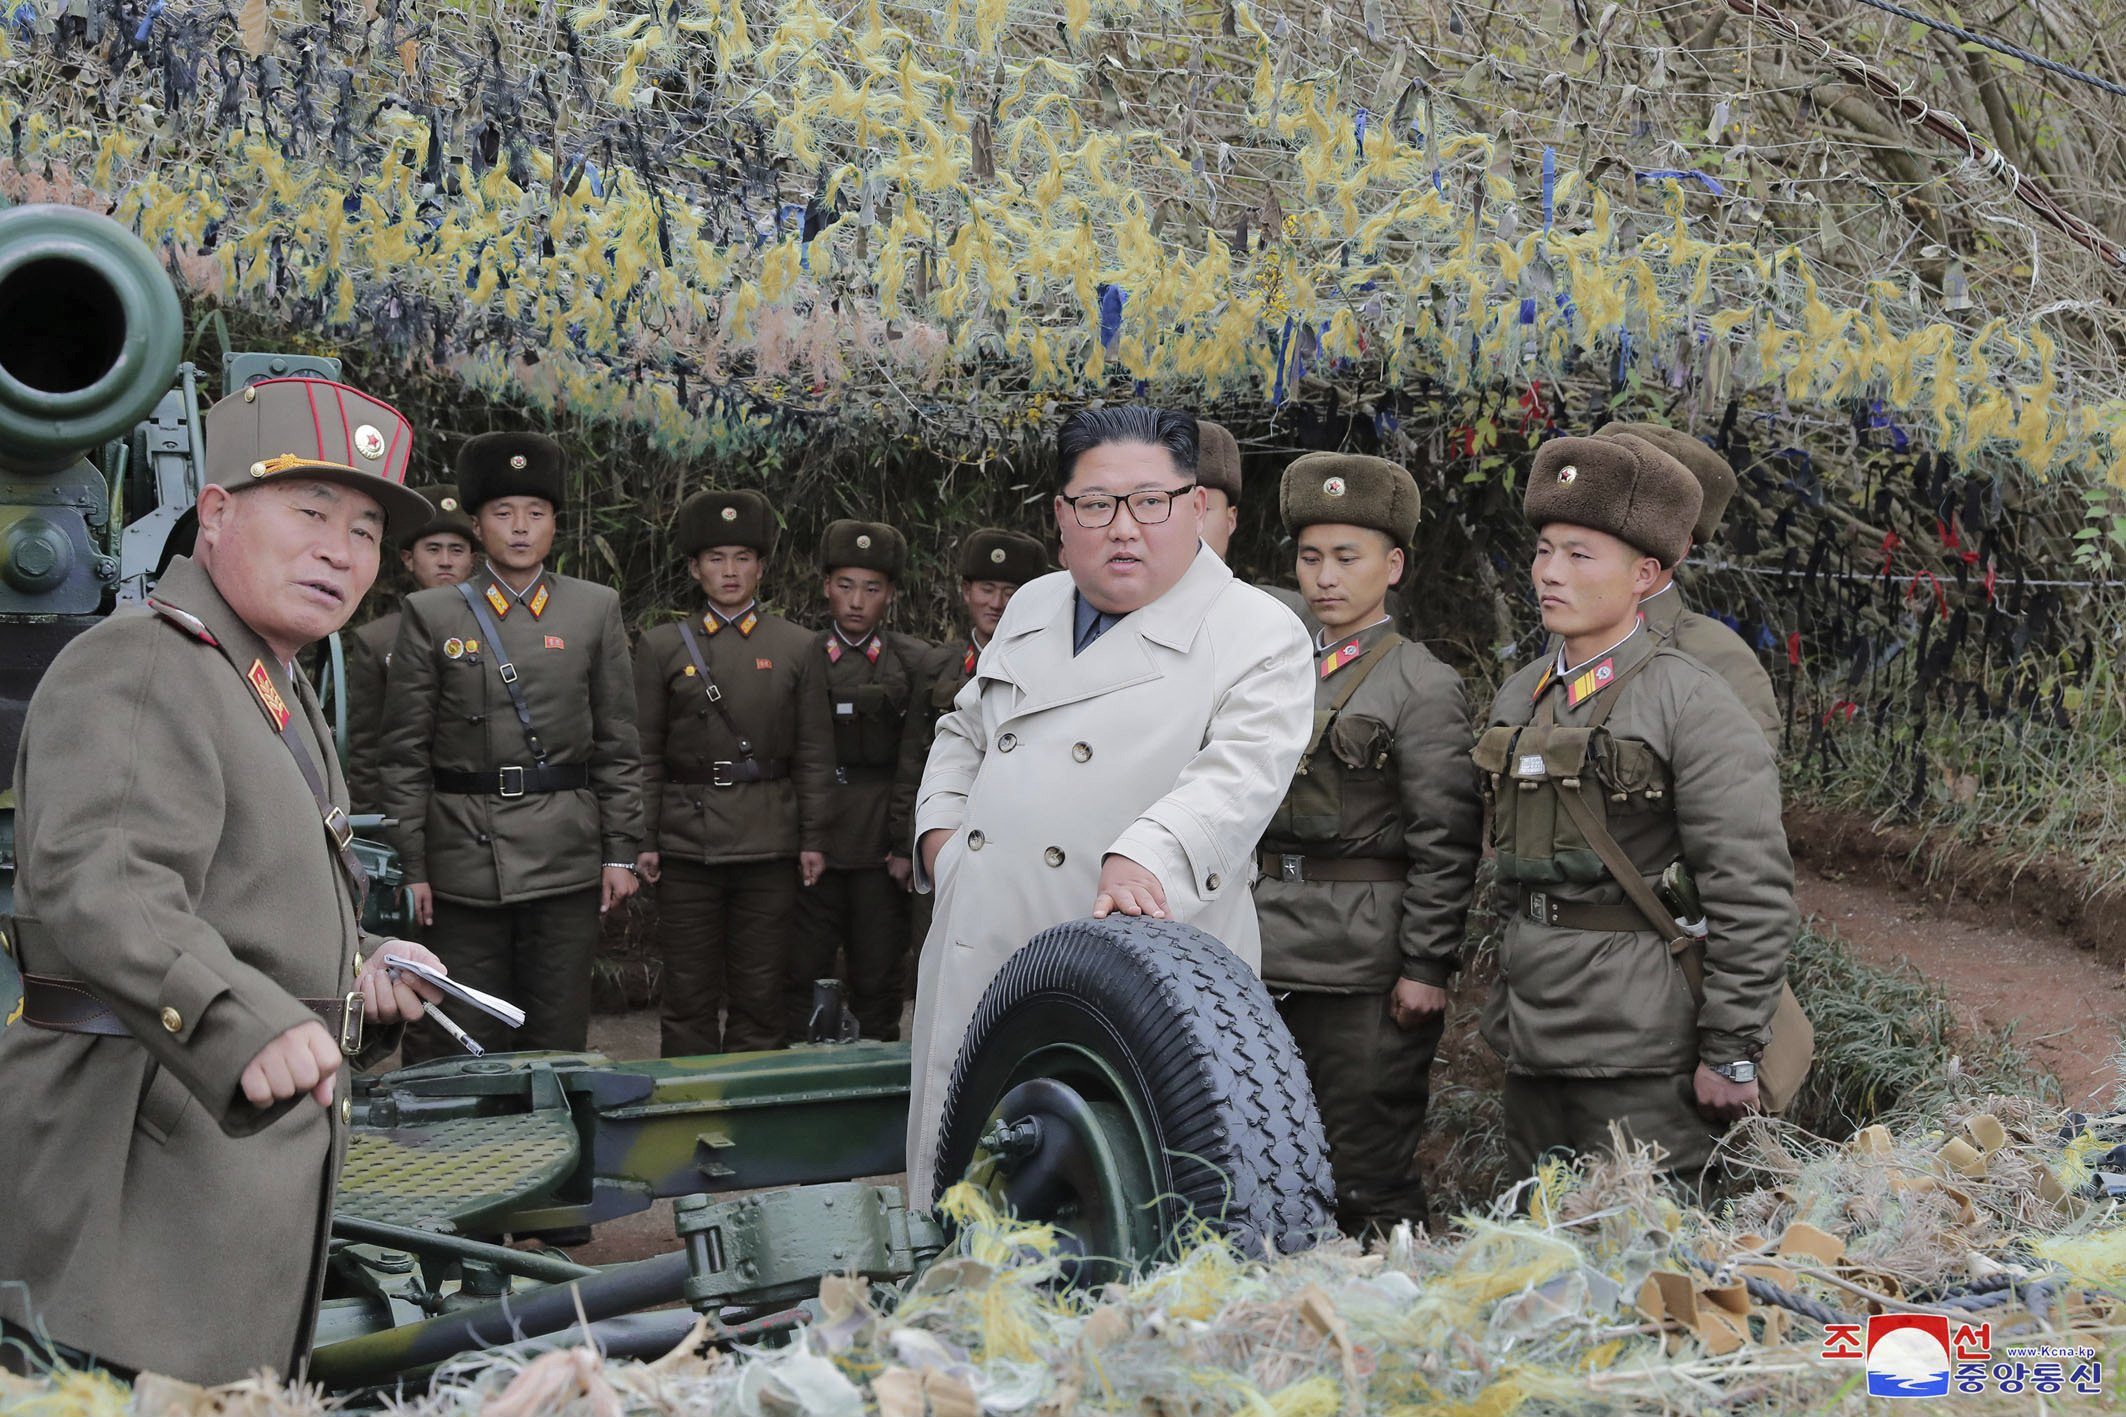 Seoul says North Korea has fired 2 short-range projectiles